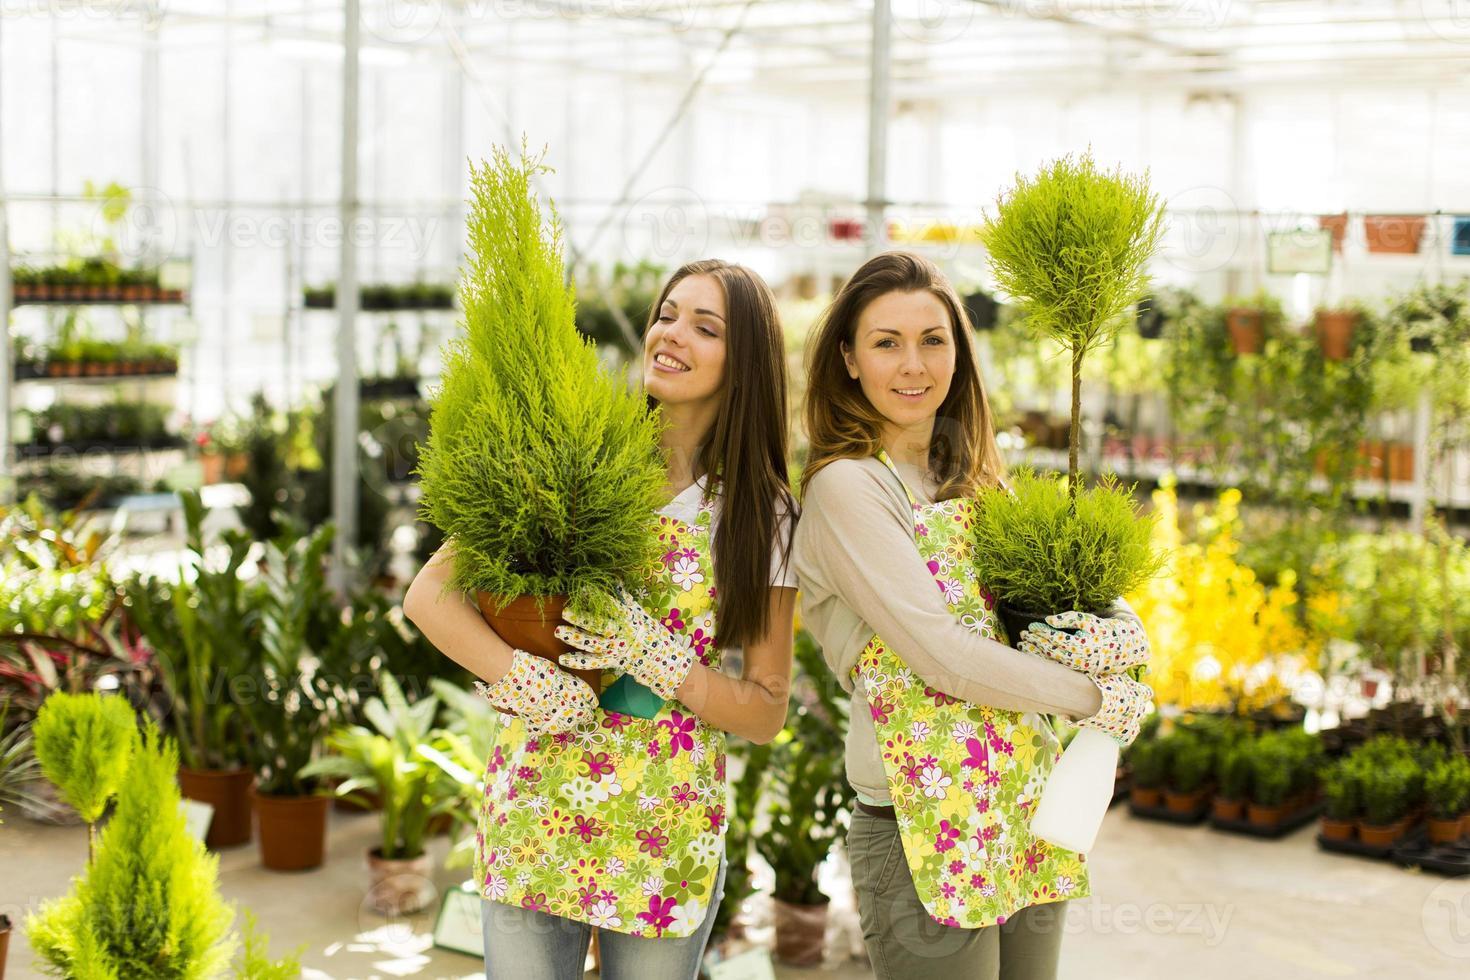 Young women in flower garden photo